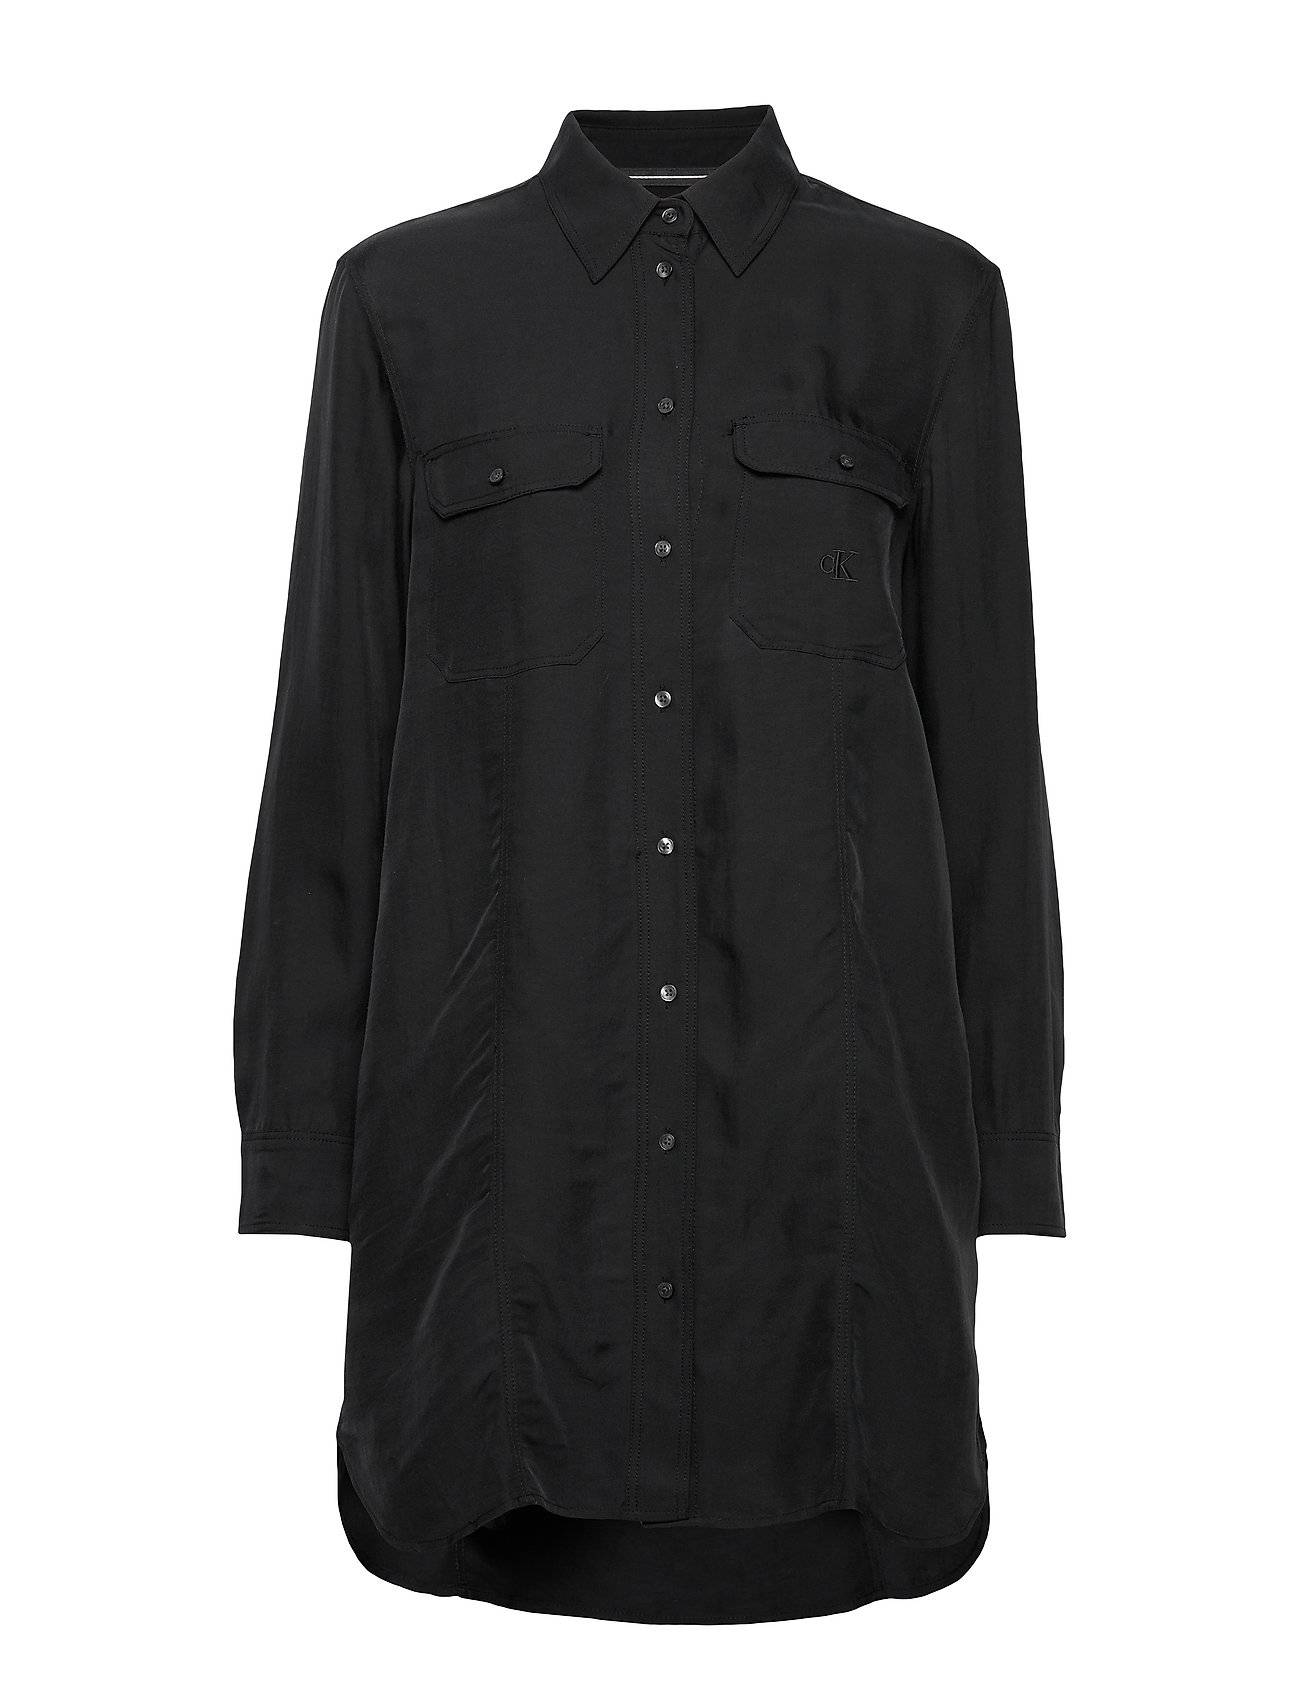 Image of Calvin Drapey Utitlity Shirt Dress Polvipituinen Mekko Musta Calvin Klein Jeans